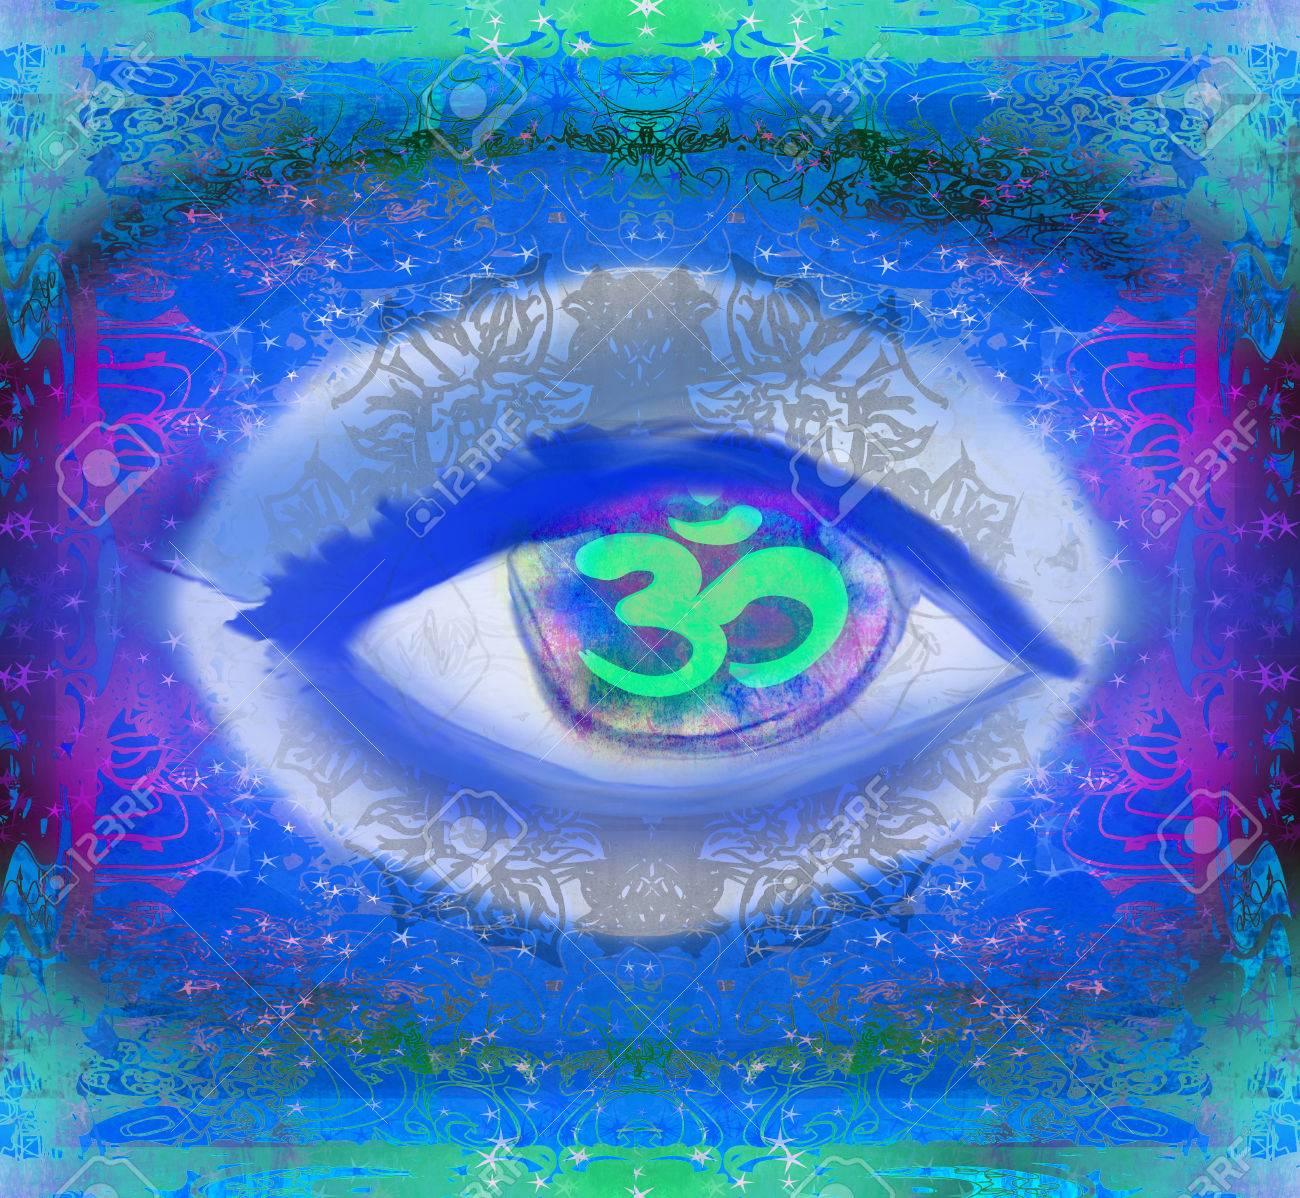 illustration of a third eye mystical sign - 50177356